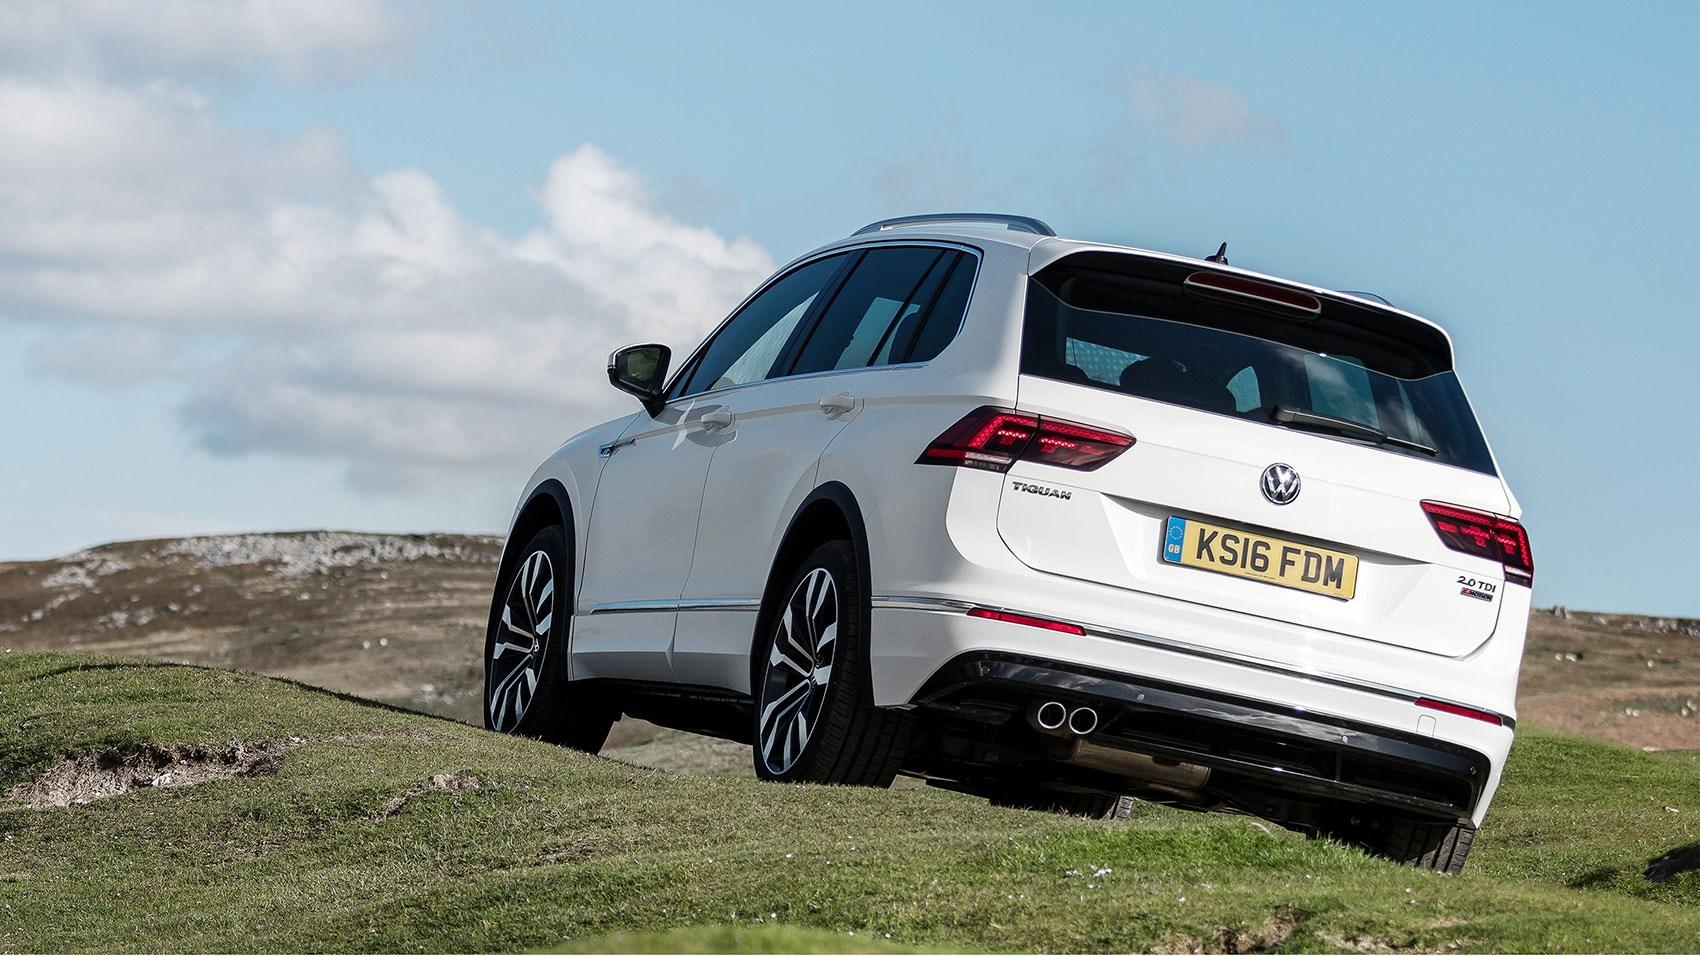 VW Tiguan RLine 20 TDI 150 4Motion DSG 2016 review by CAR Magazine